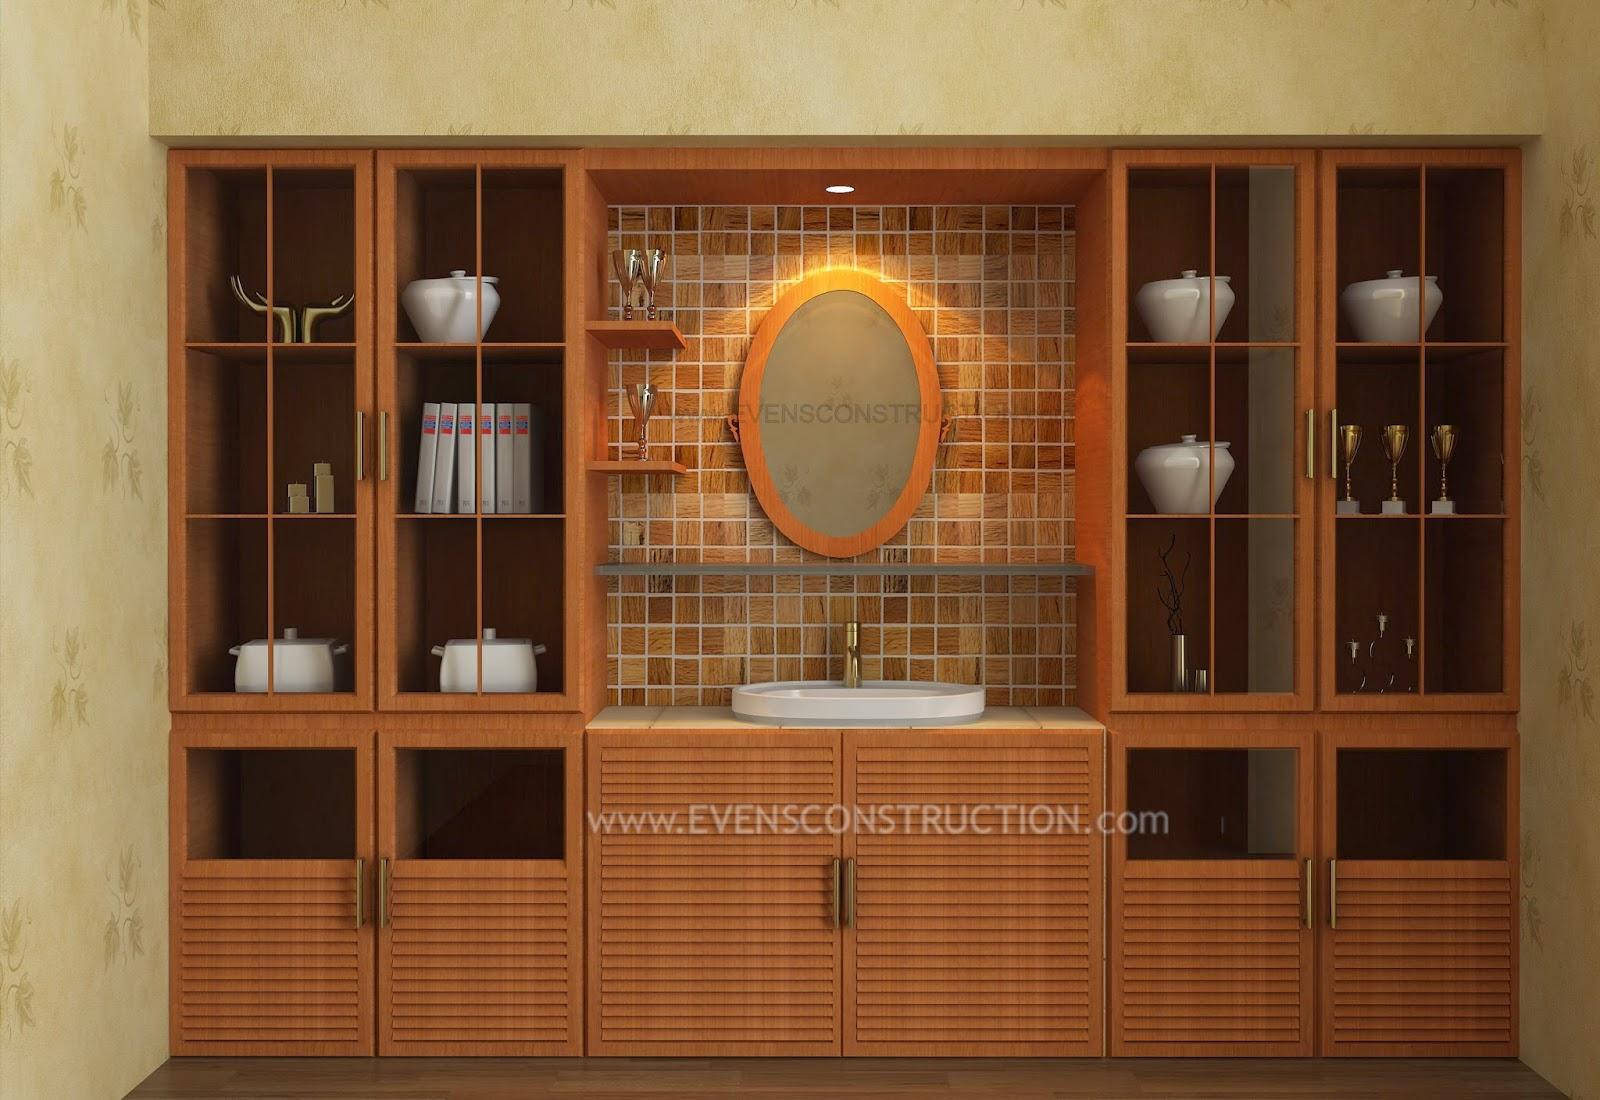 Evens Construction Pvt Ltd Crockery Shelf With Wash Area